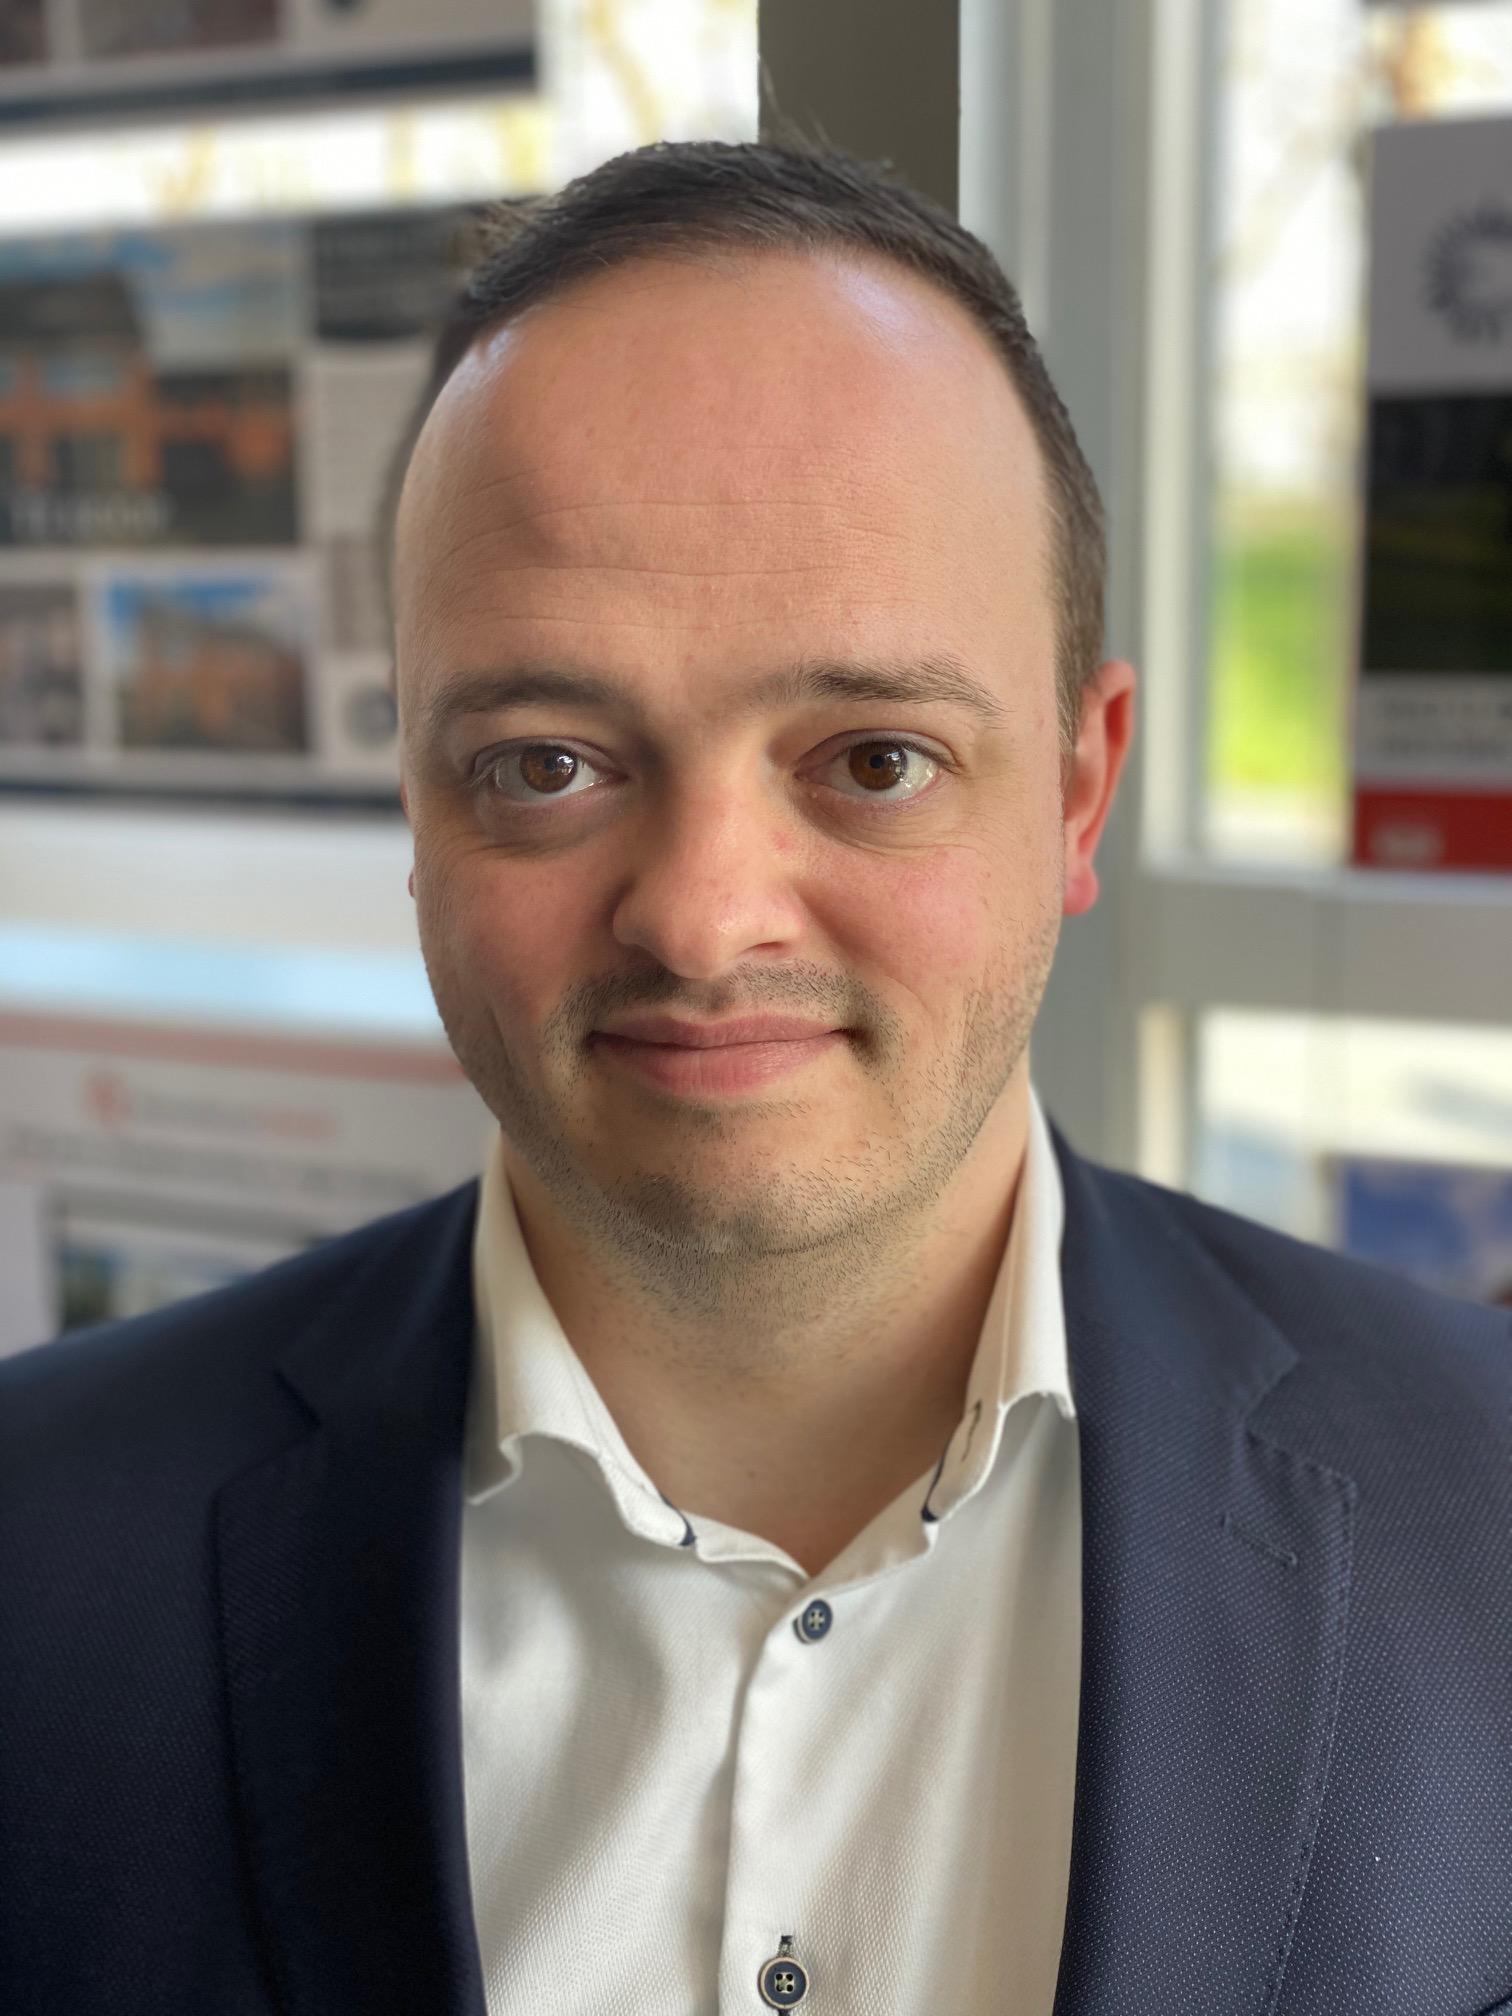 Jordi van den Maagdenberg